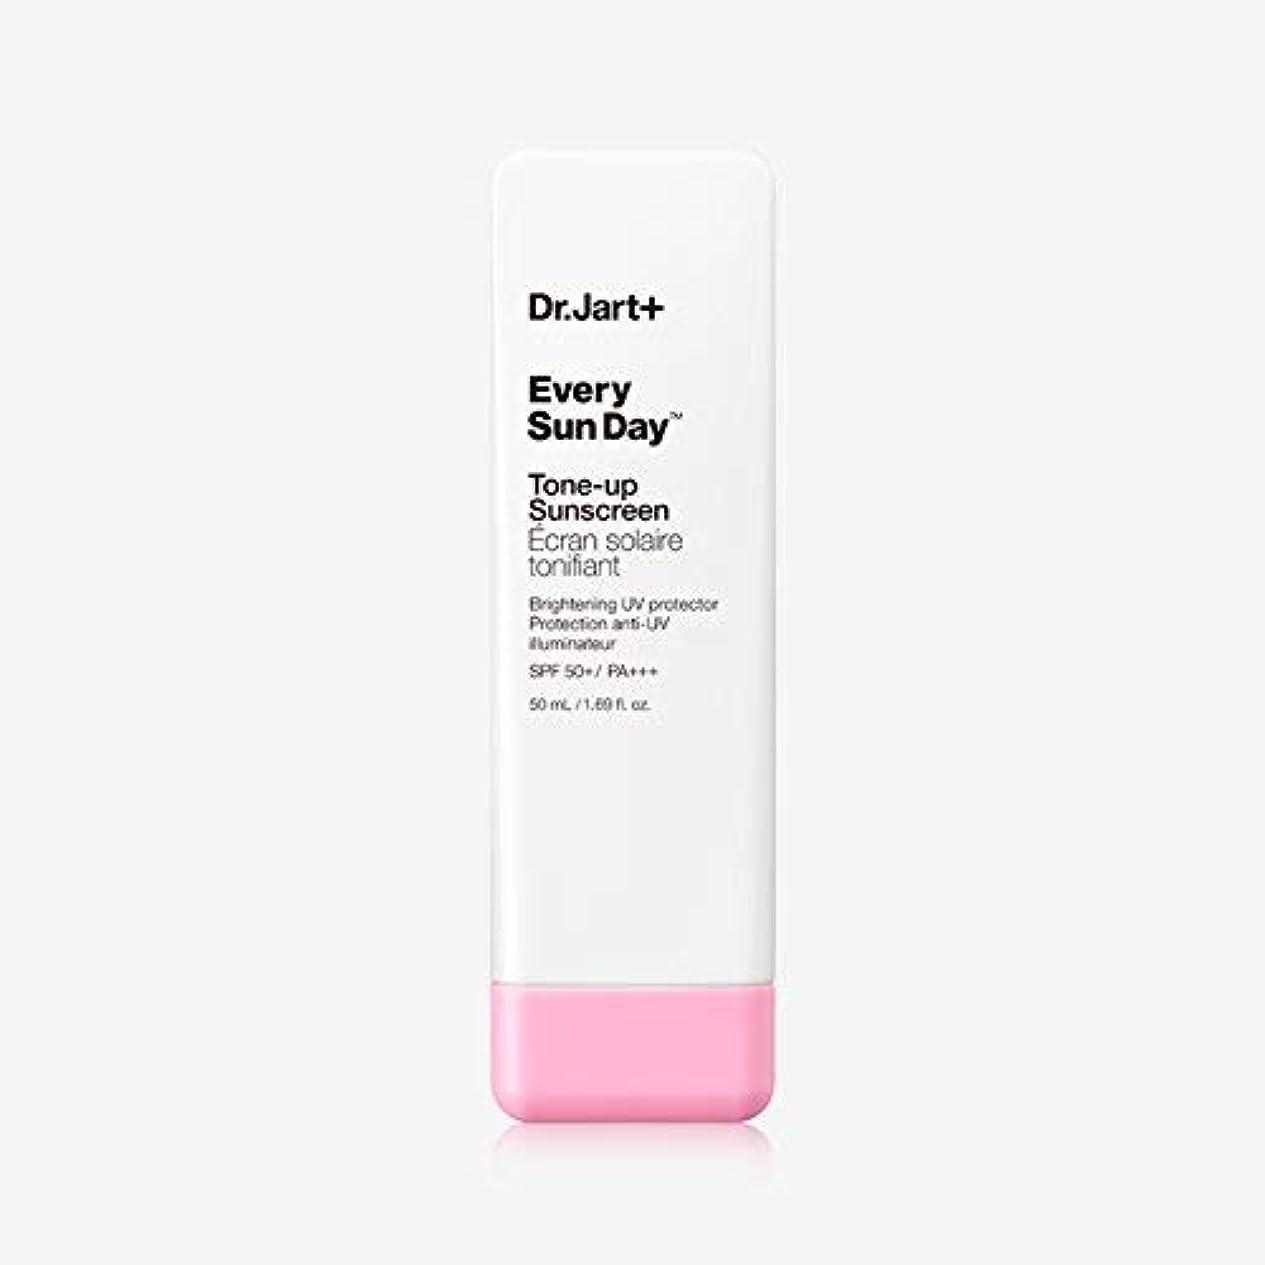 Dr.Jart+ Every Sun Day Tone-up Sunscreen SPF50+ PA+++ 50ml / ドクタージャルトゥエヴリサンデートーンアップサンスクリーンSPF50+PA+++50ml [並行輸入品]